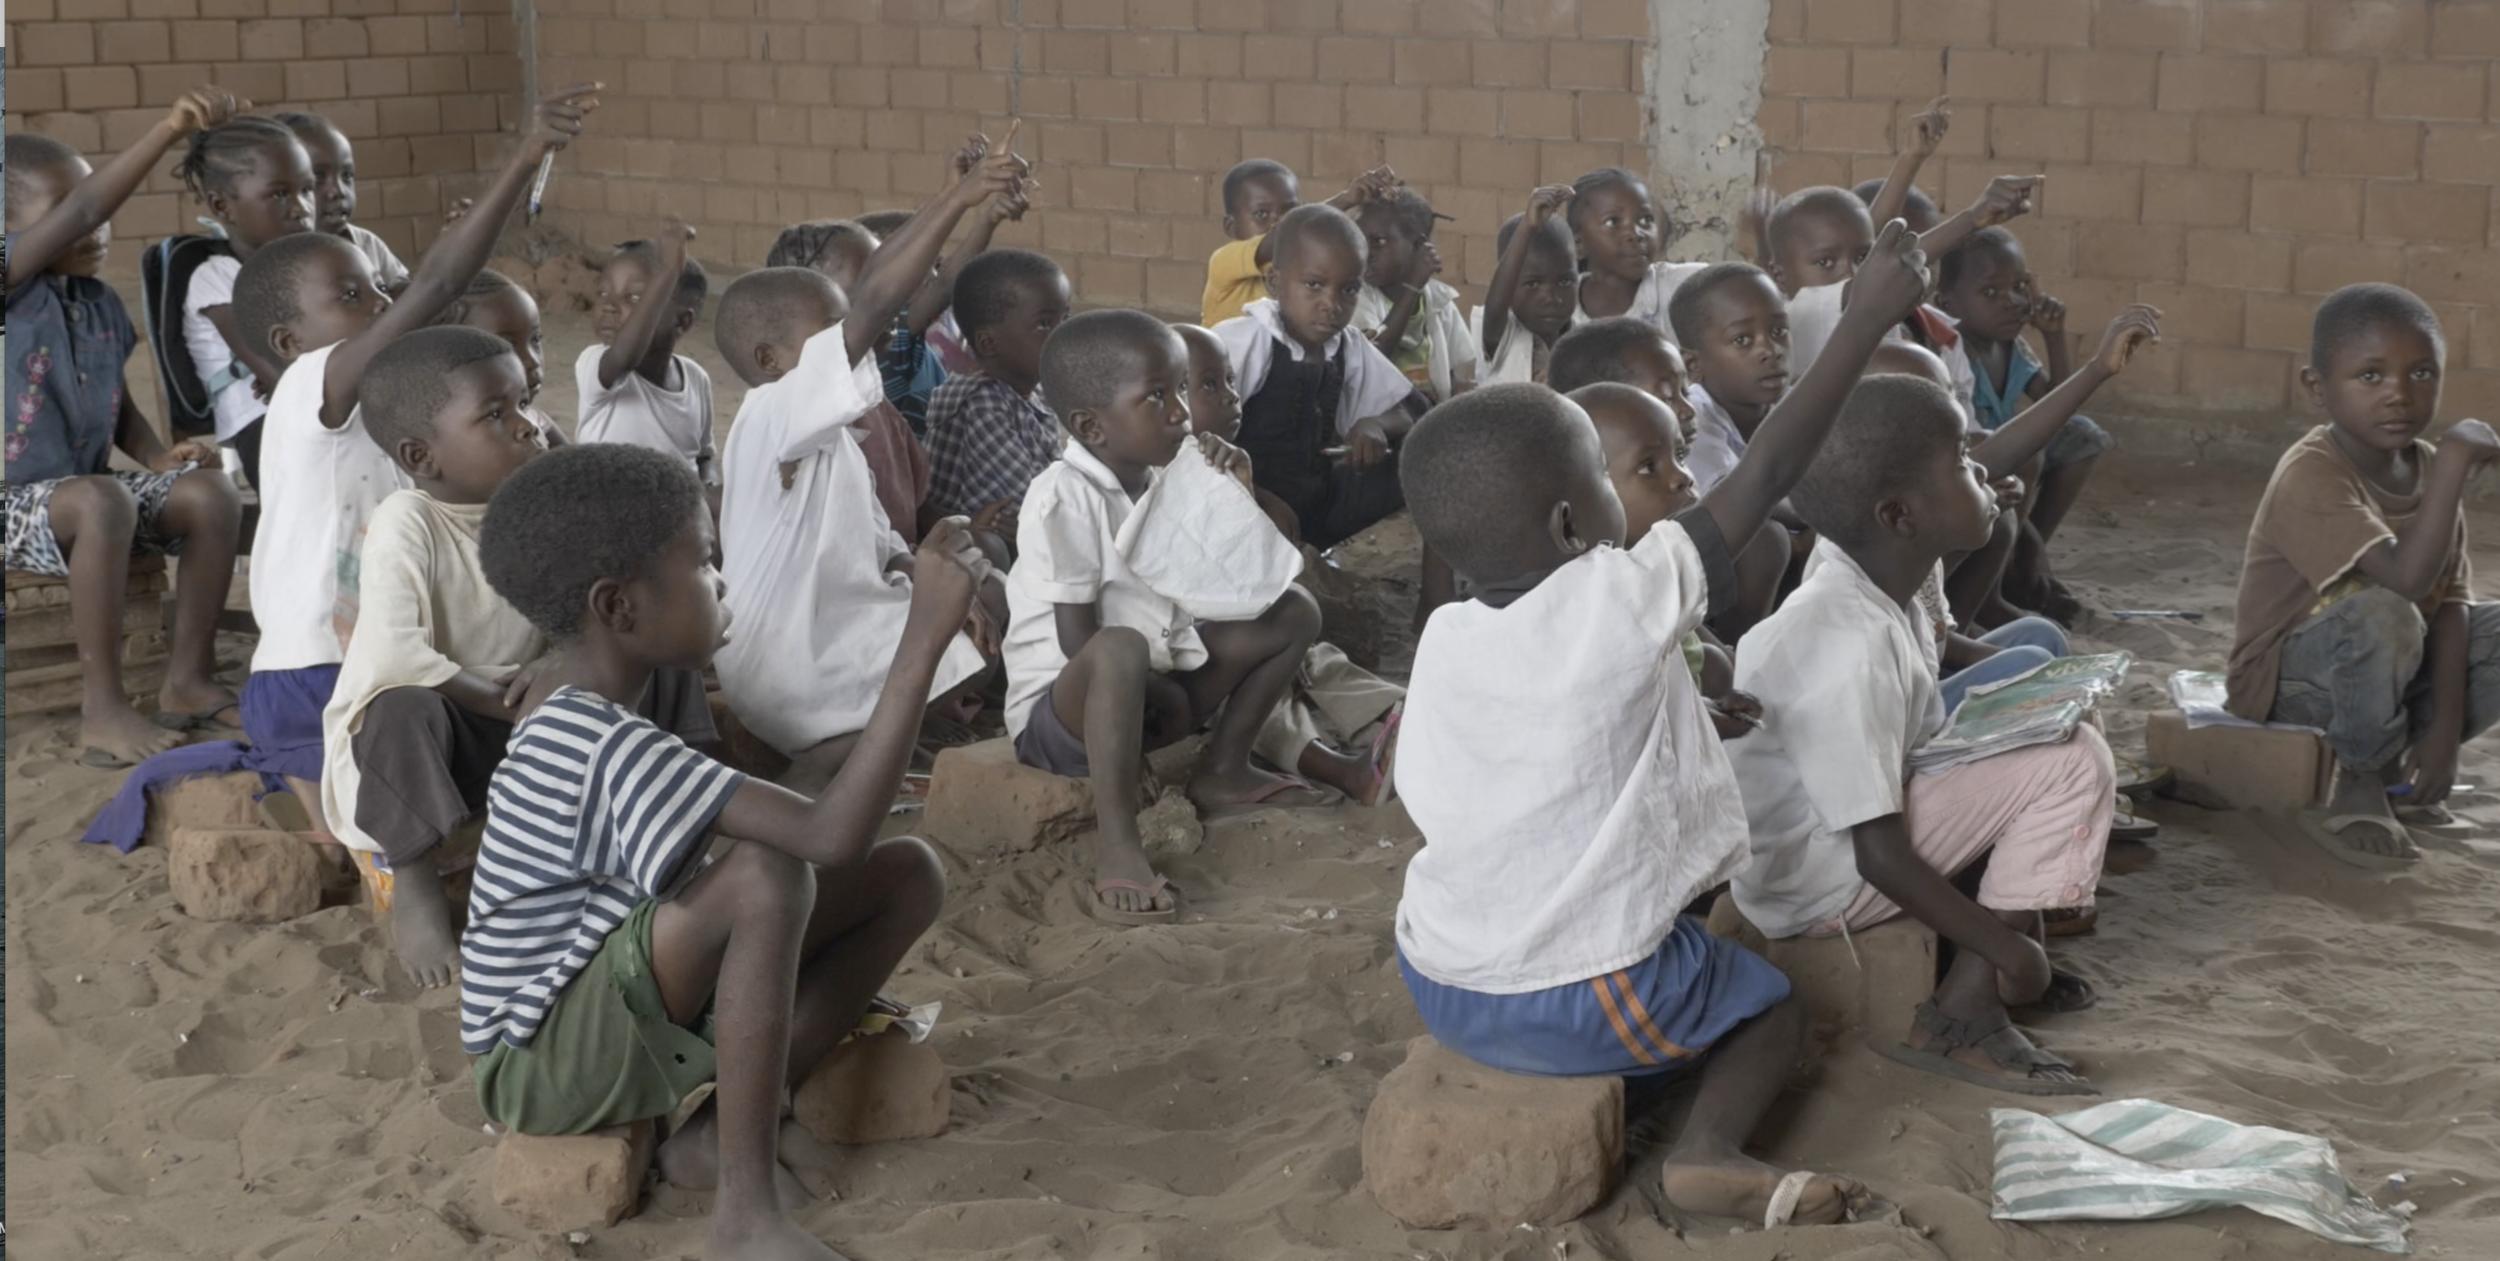 Gufwa-Gubila Primary School - 276 Students (129 girls, 147 boys)13 Classes and 14 Staff (4 Women)